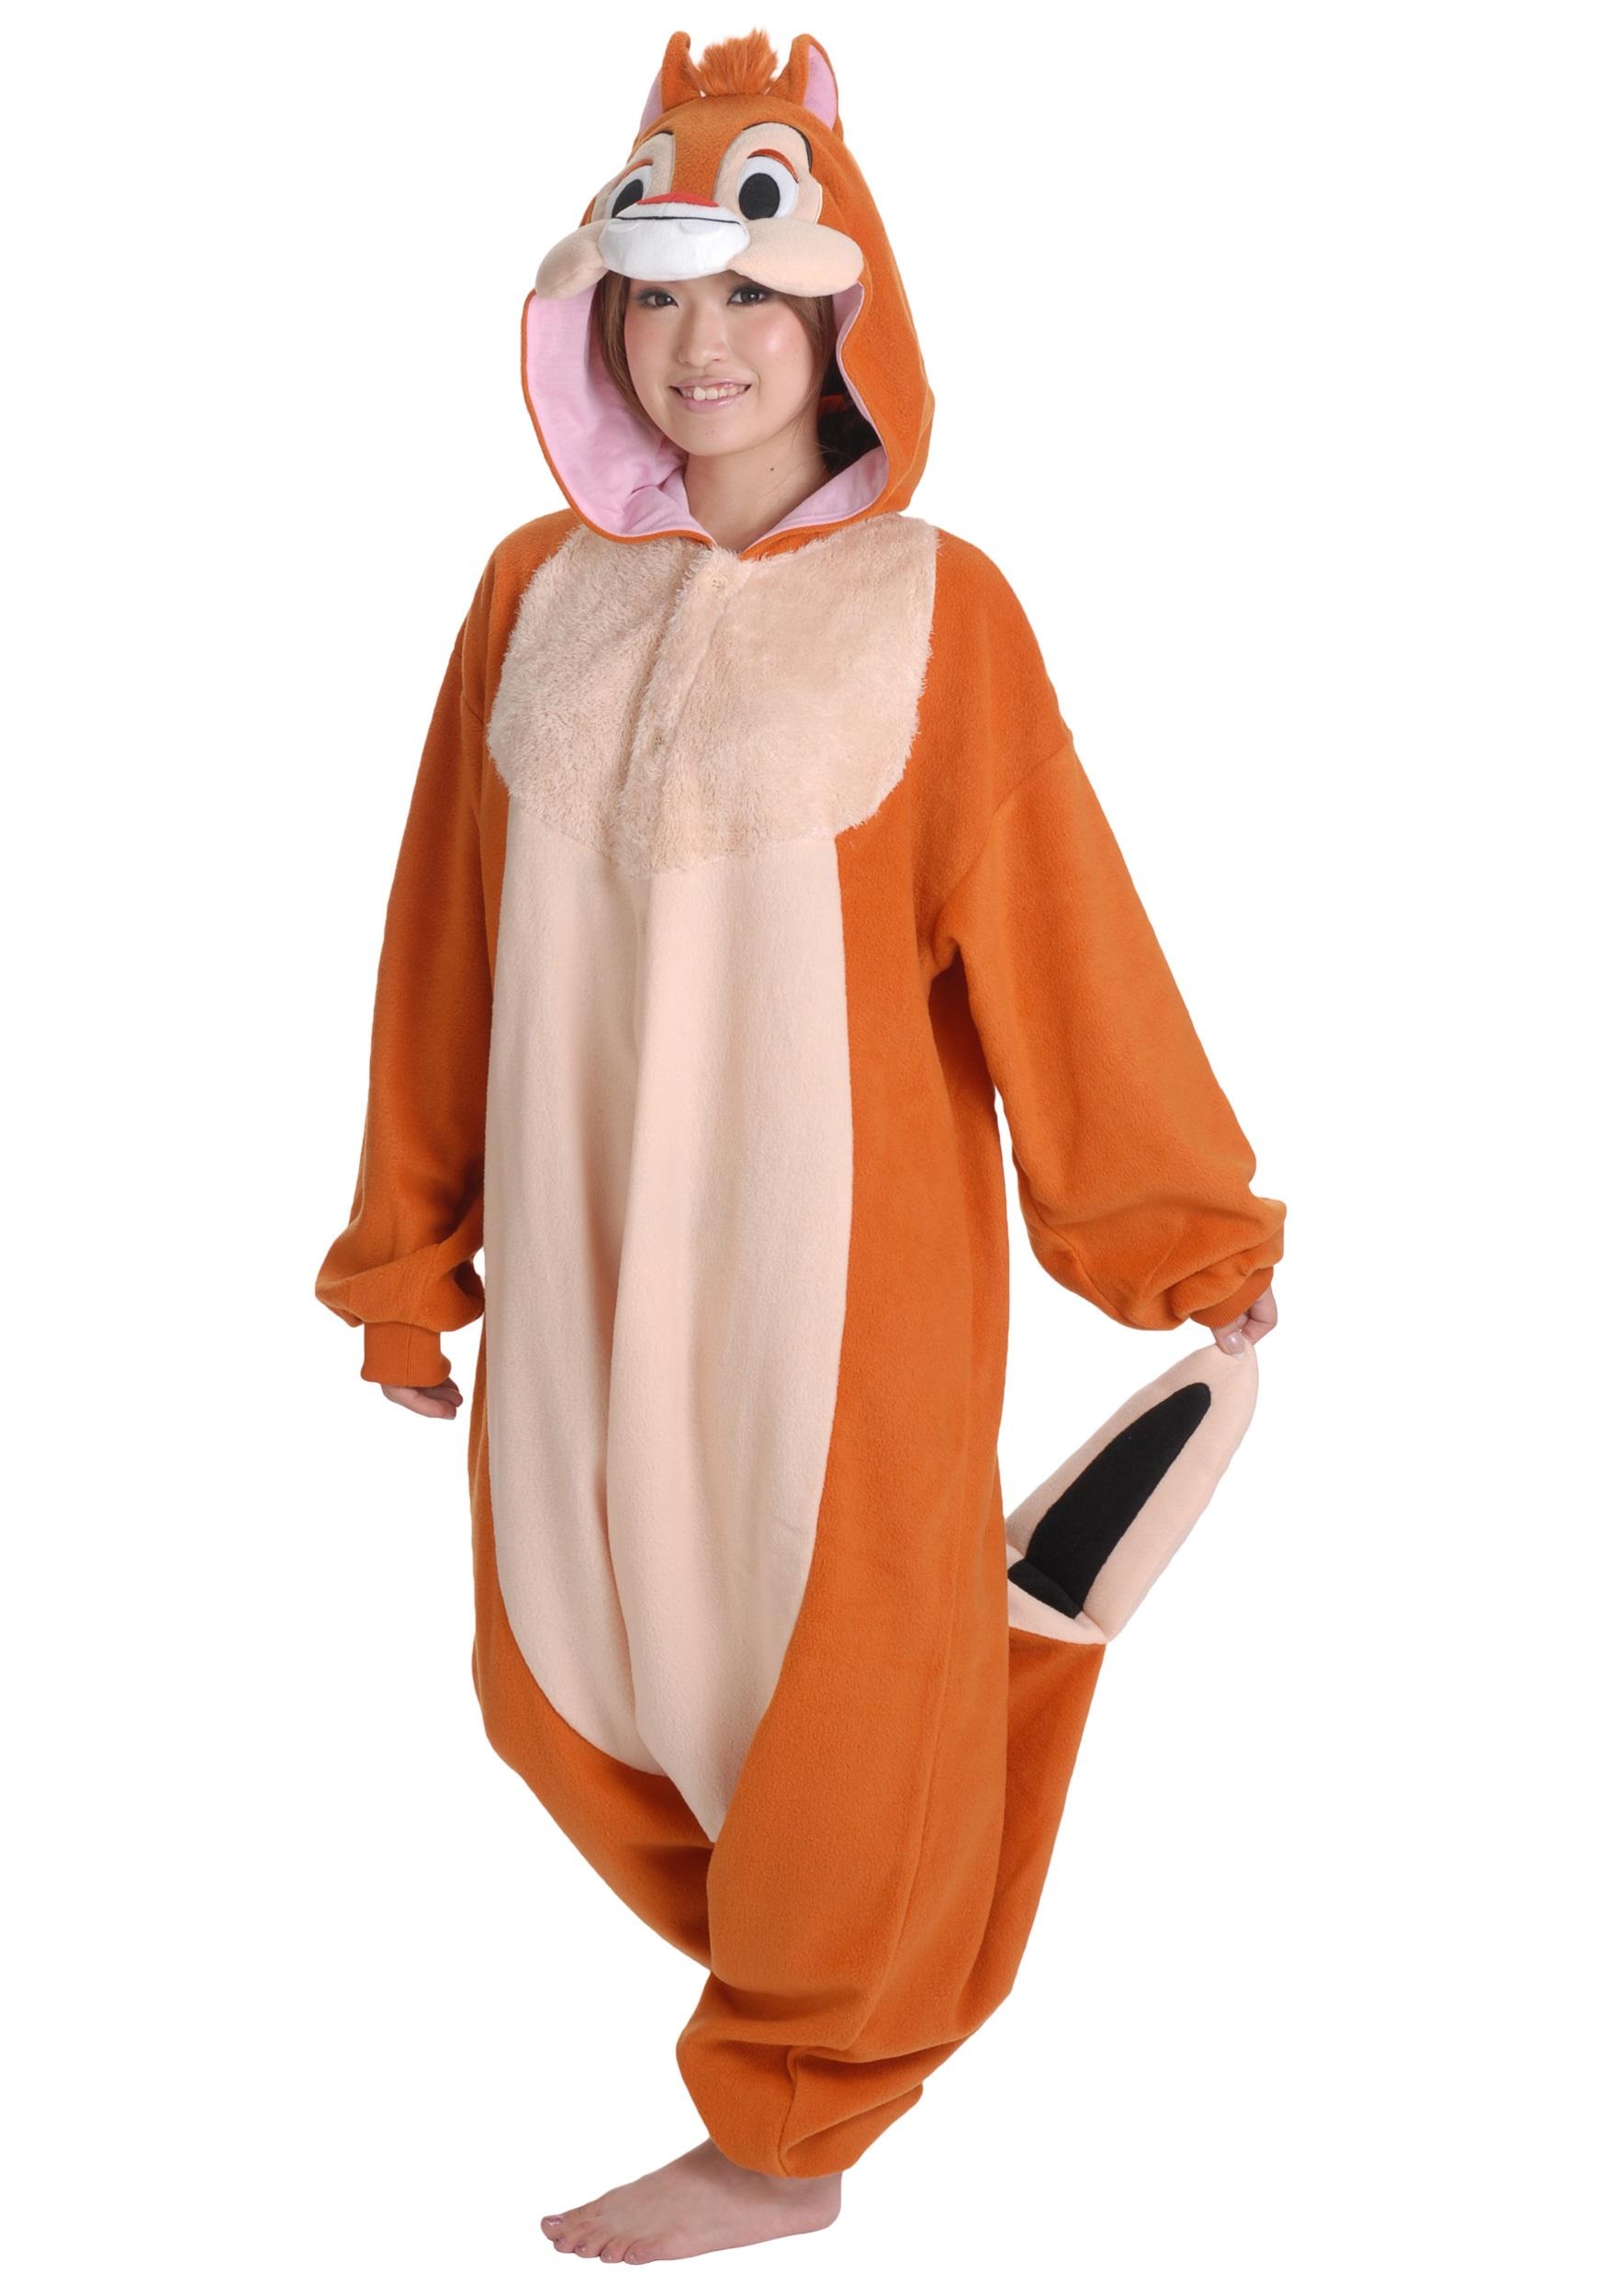 Amazoncom: disney costume adult